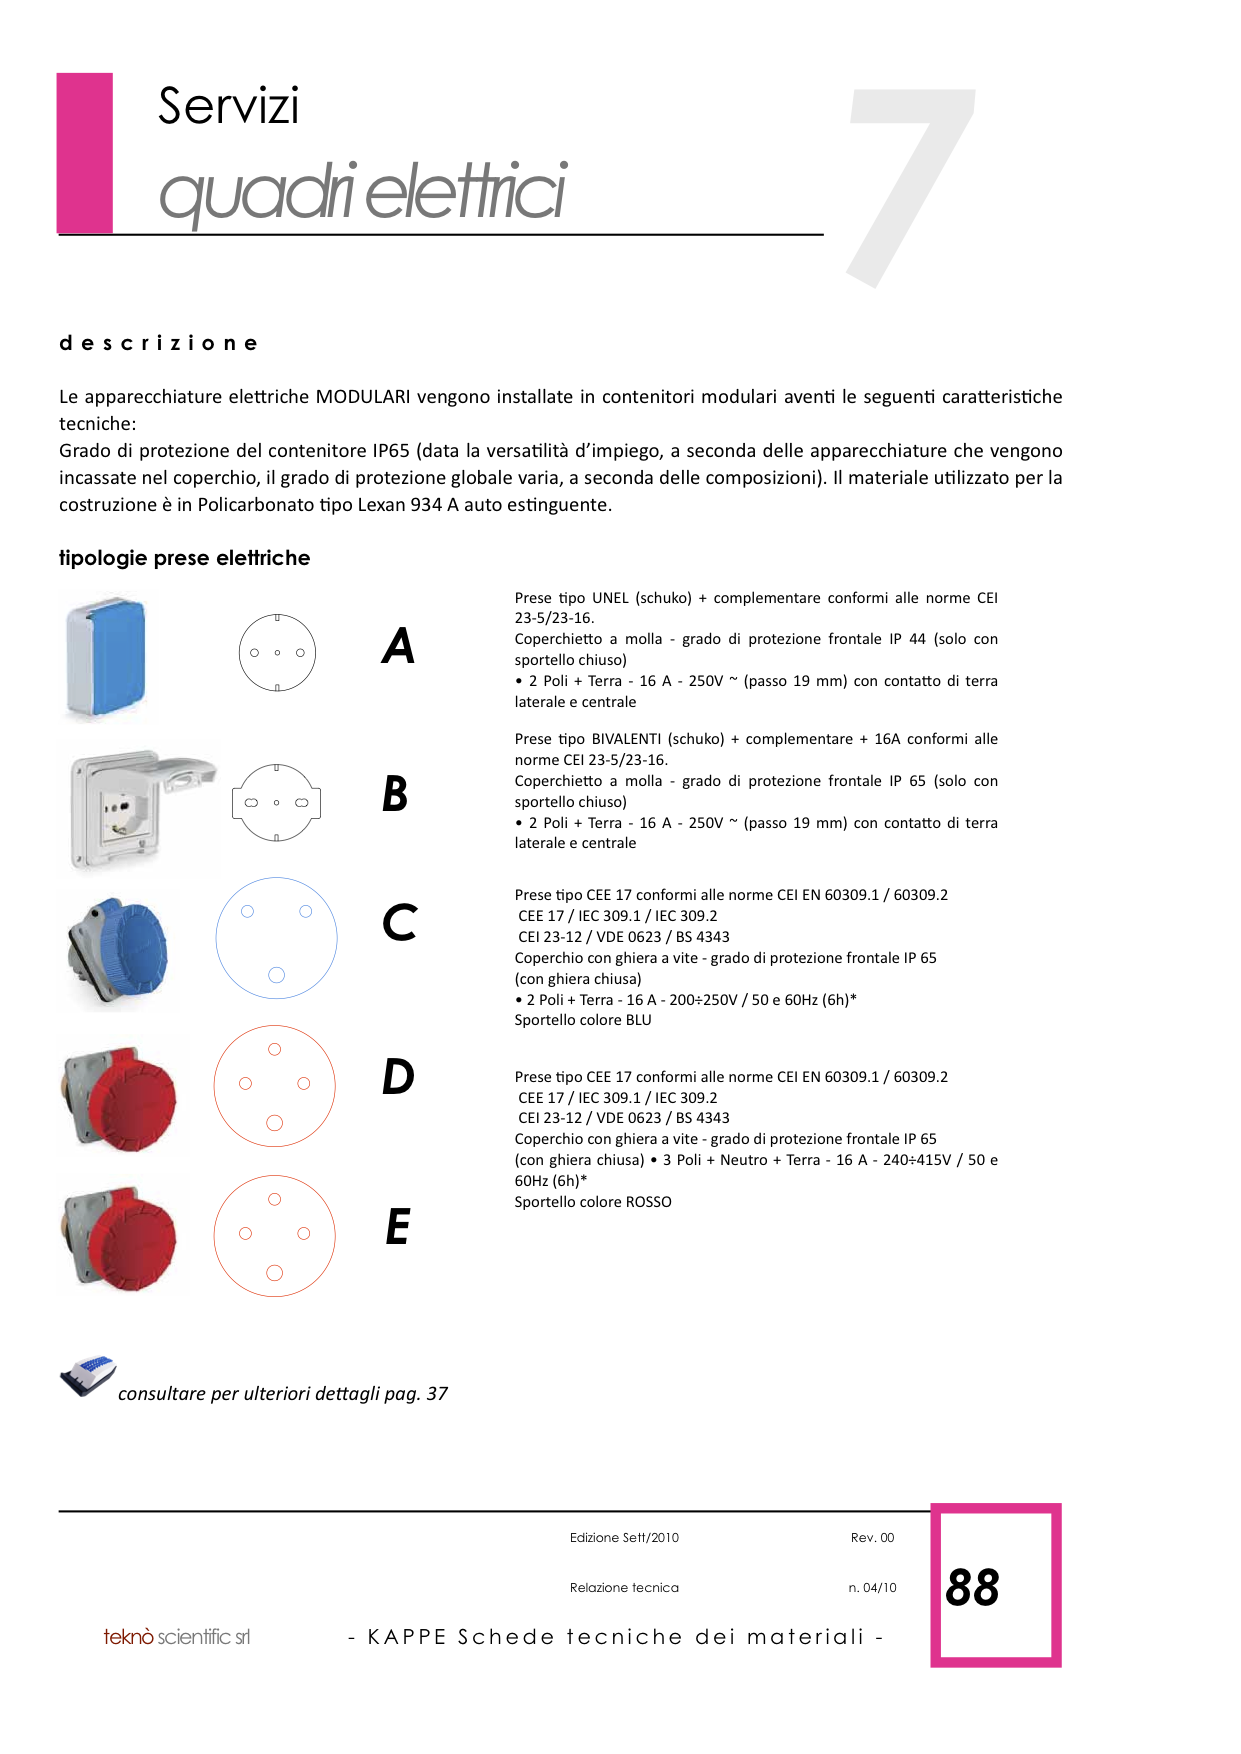 KAPPE Schede tecniche materiali copia 38.png